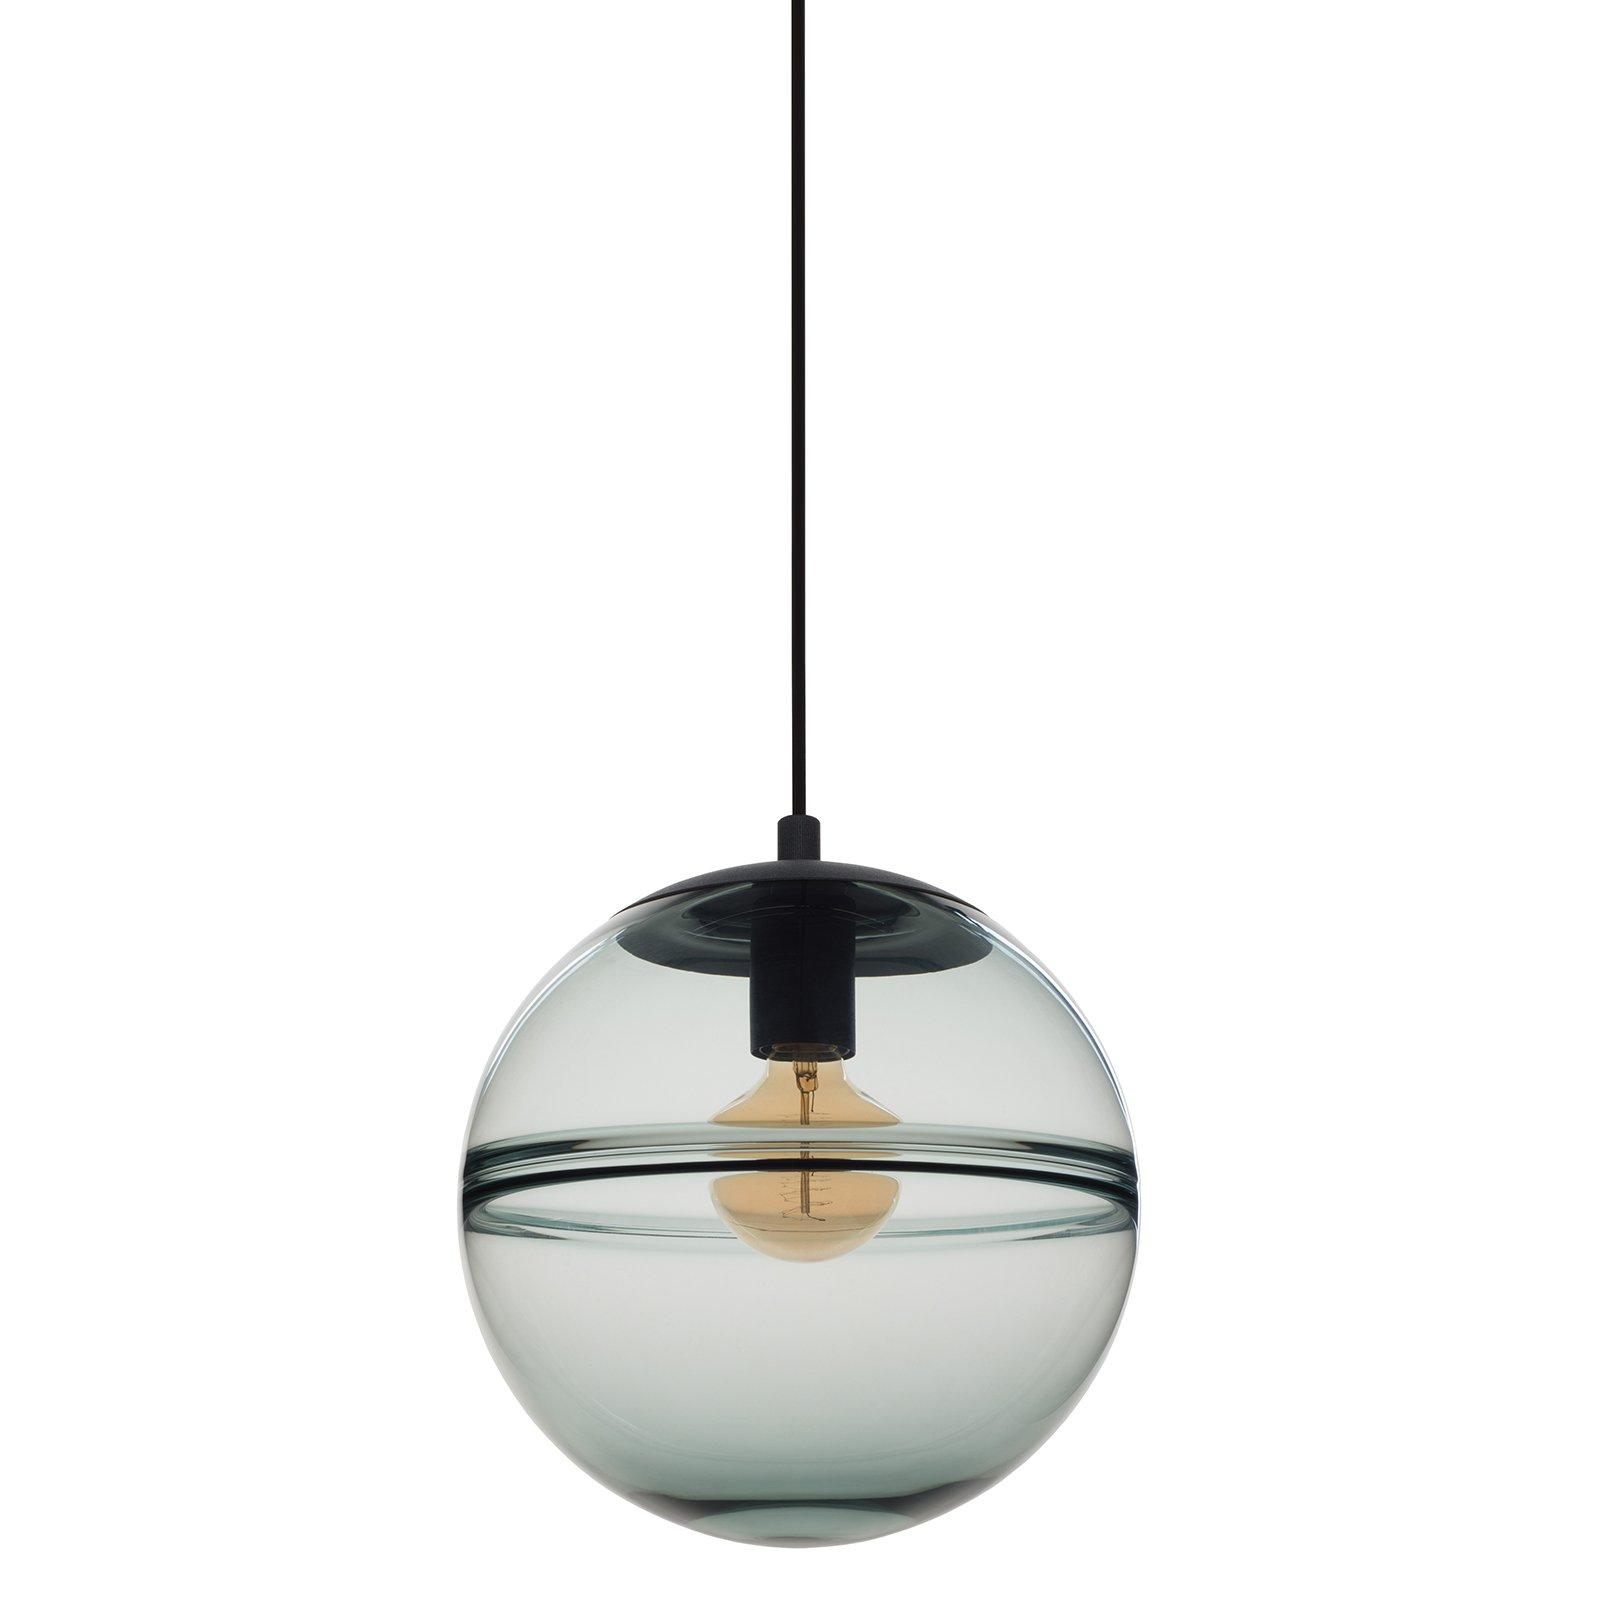 CASAMOTION Unique Optic Contemporary Hand Blown Glass Pendant Light, Ceiling Hanging Lighting Fixtures, Light Grey Blue